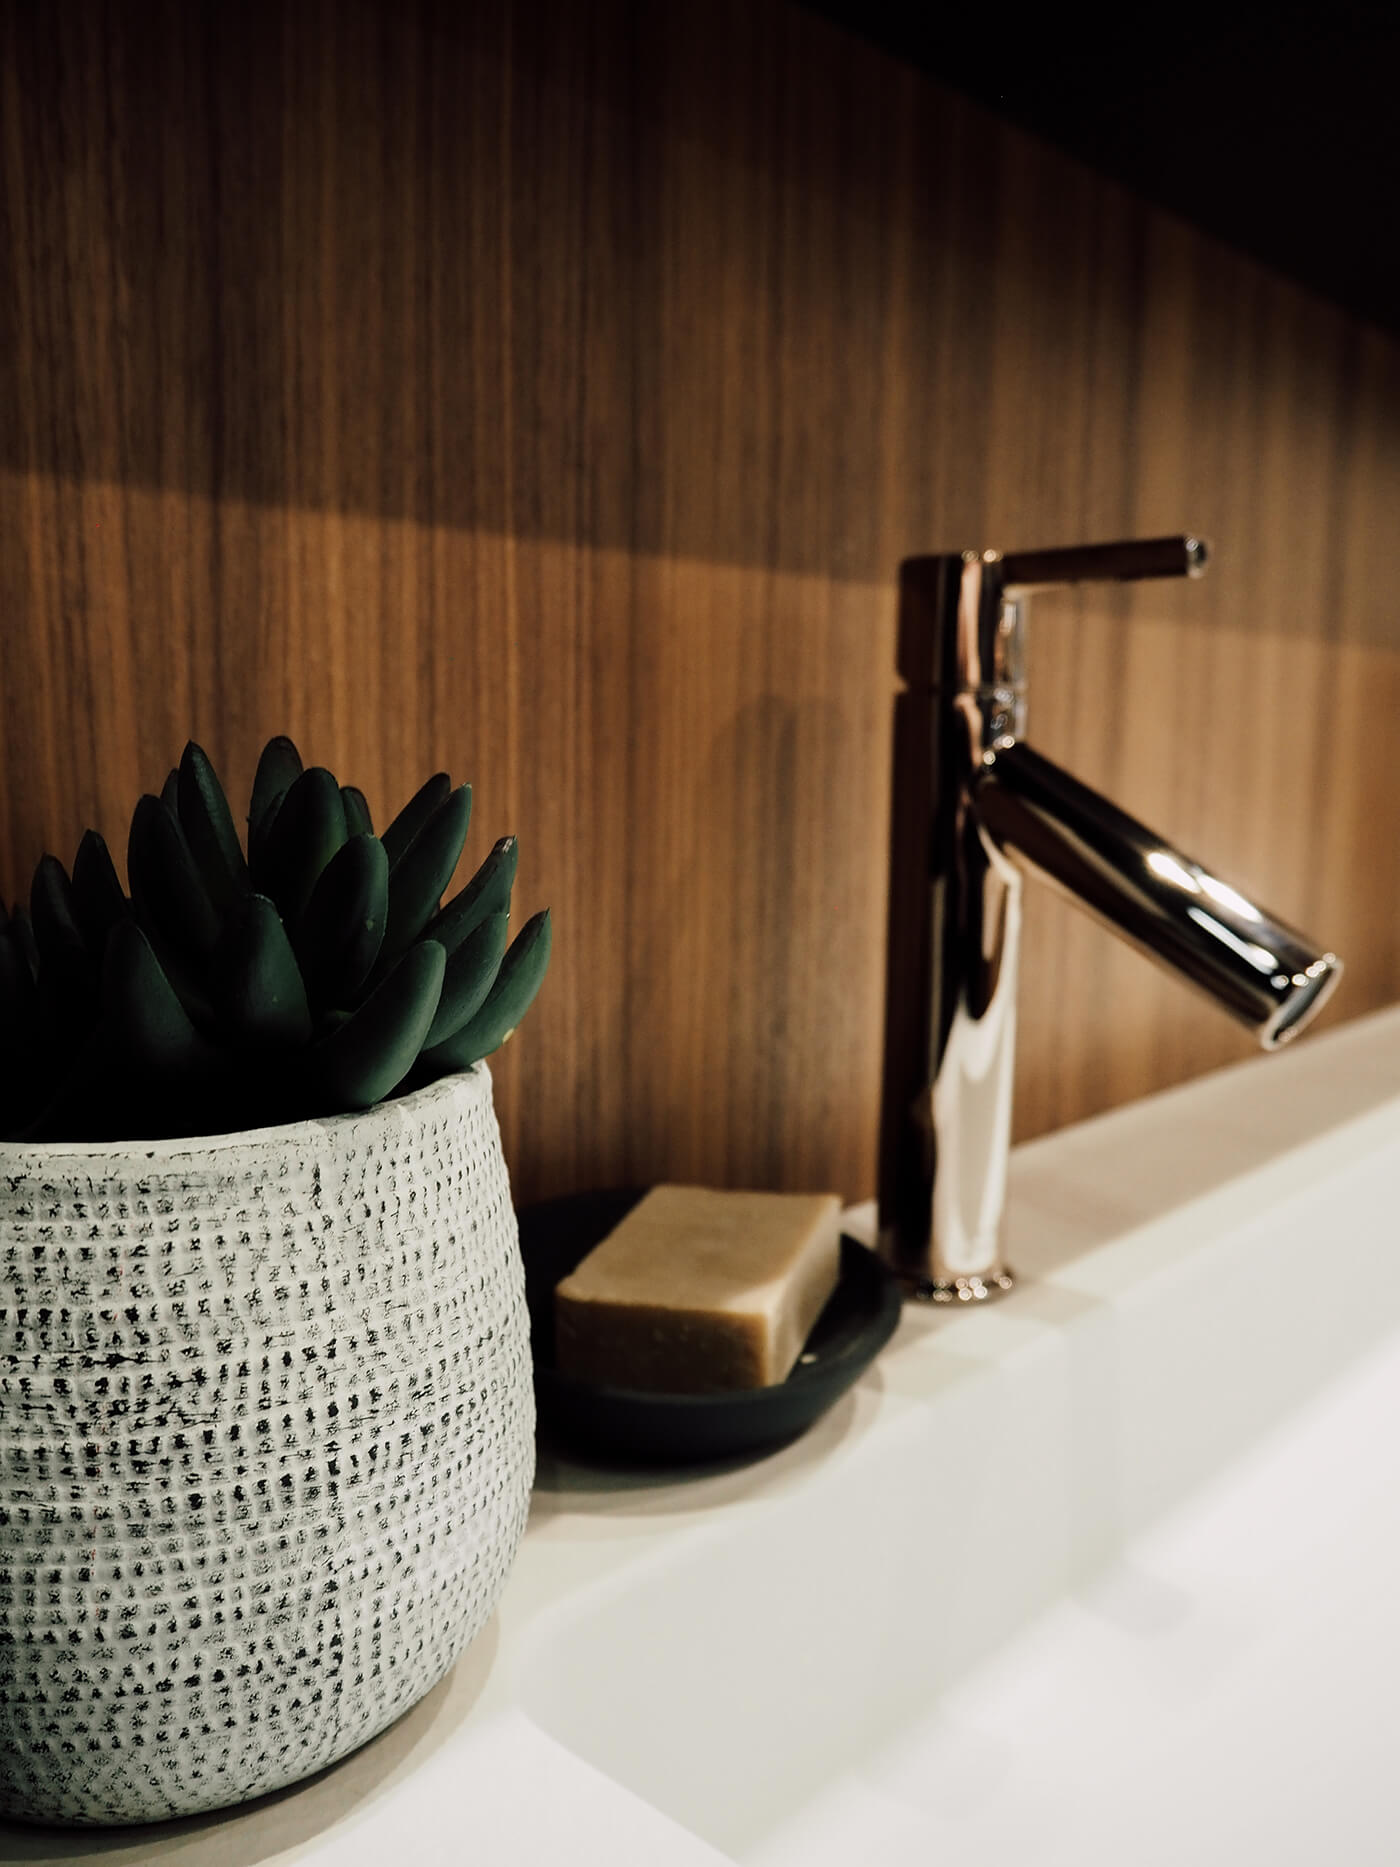 Robinet cuivre salle de bain